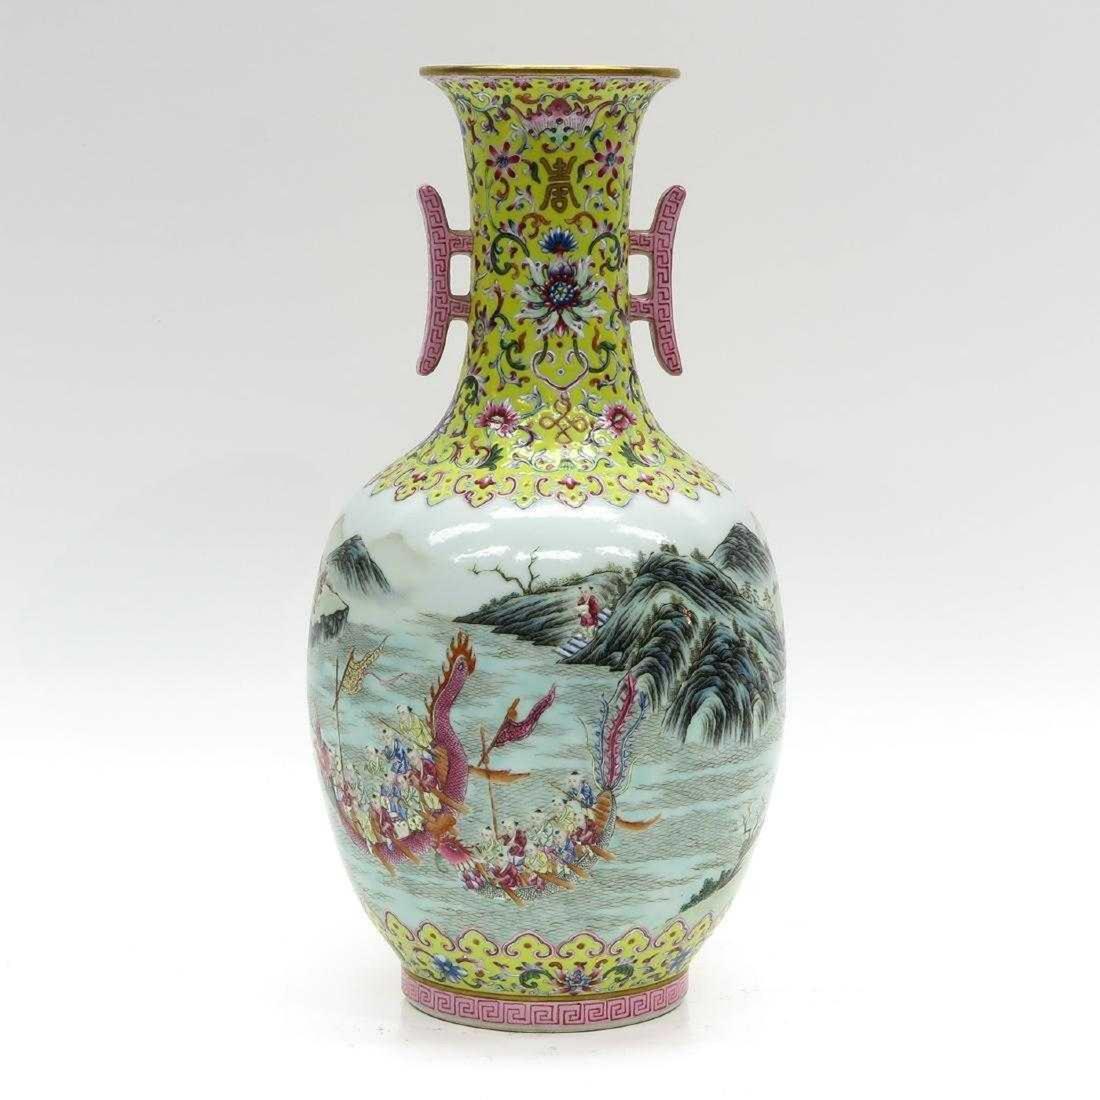 Chinese Famille Rose Enamel Decor Vase